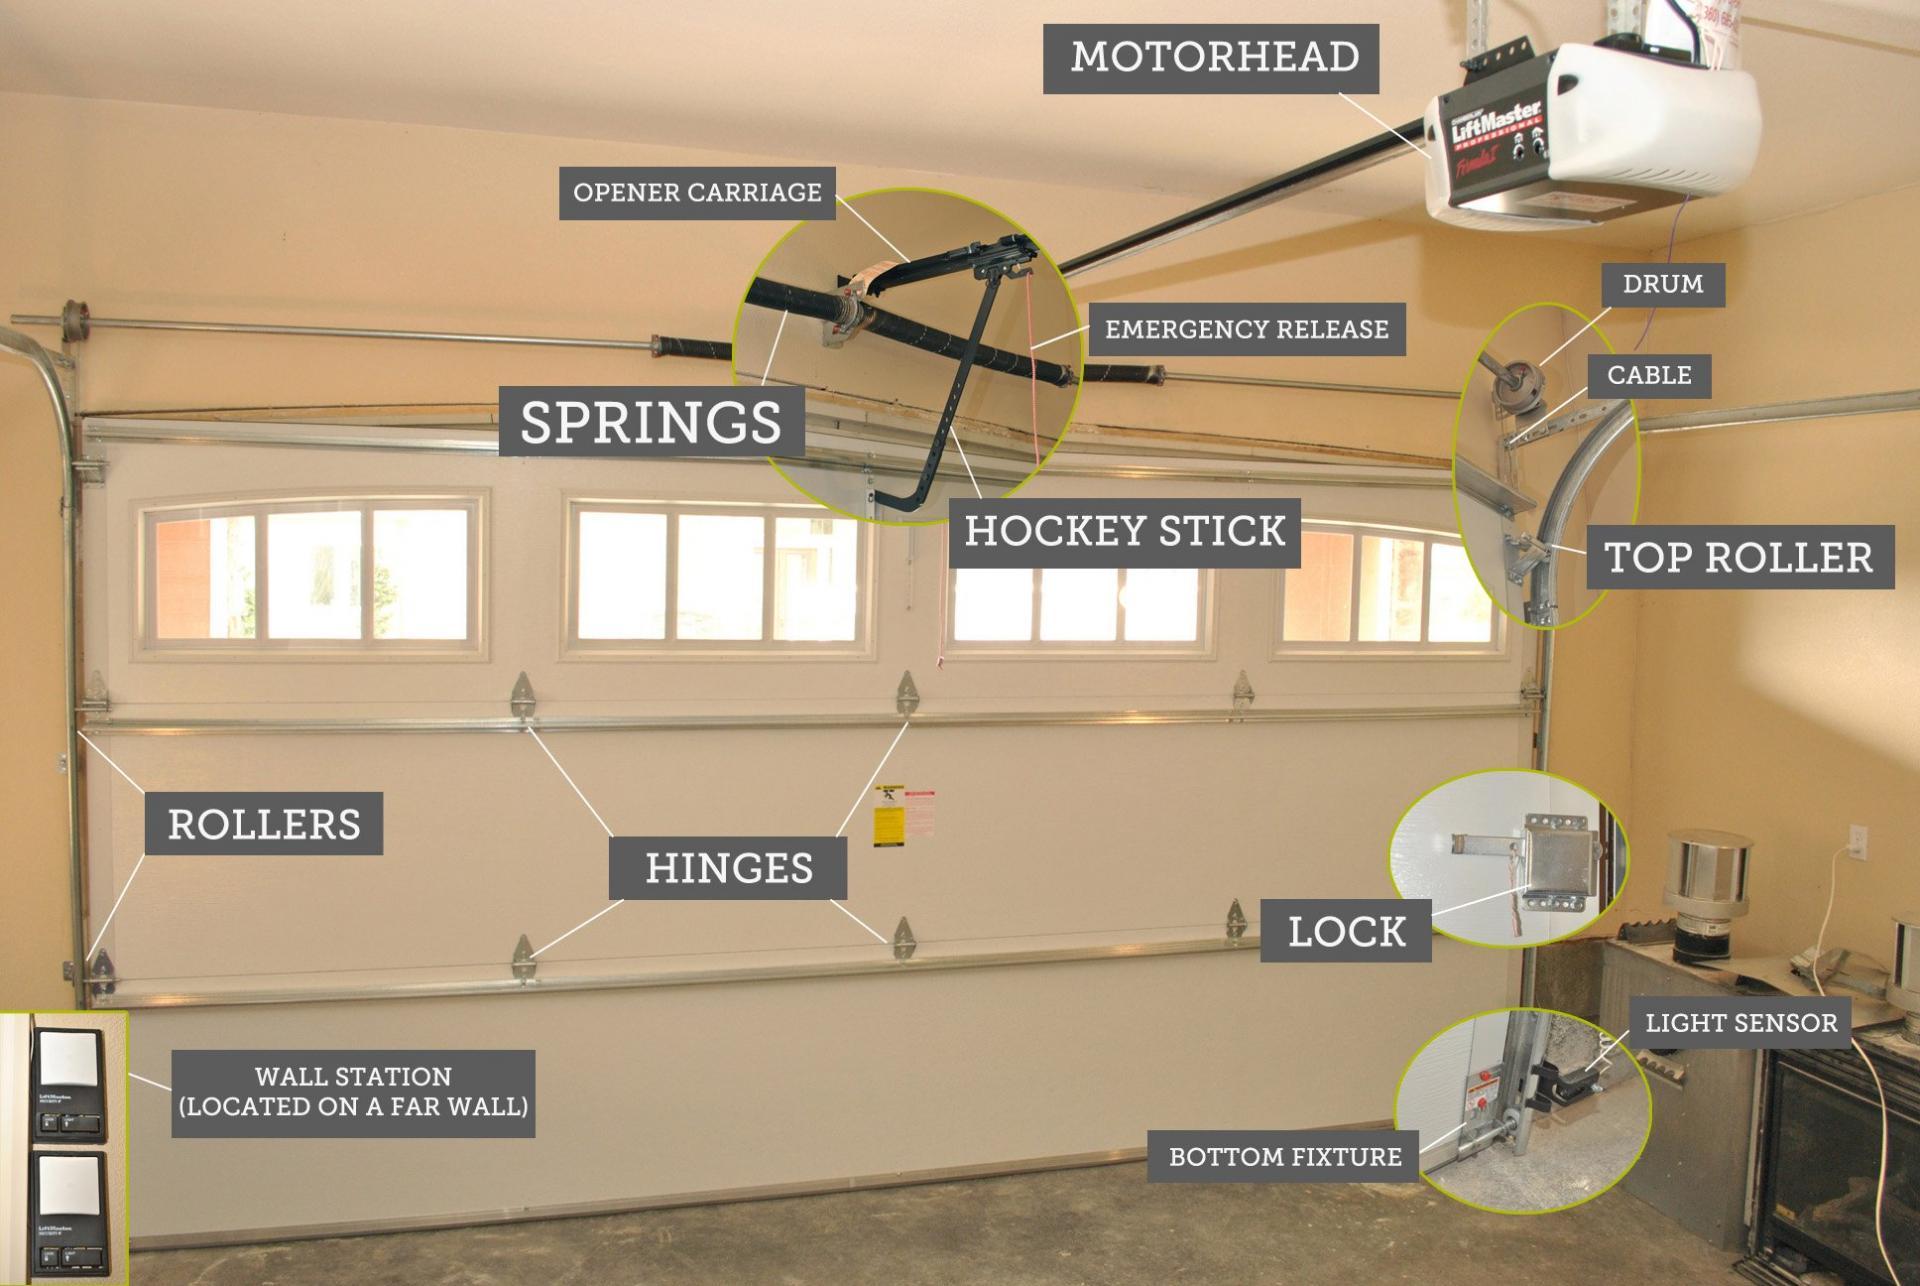 Garage Door Repair Motors Springs Cables Openers